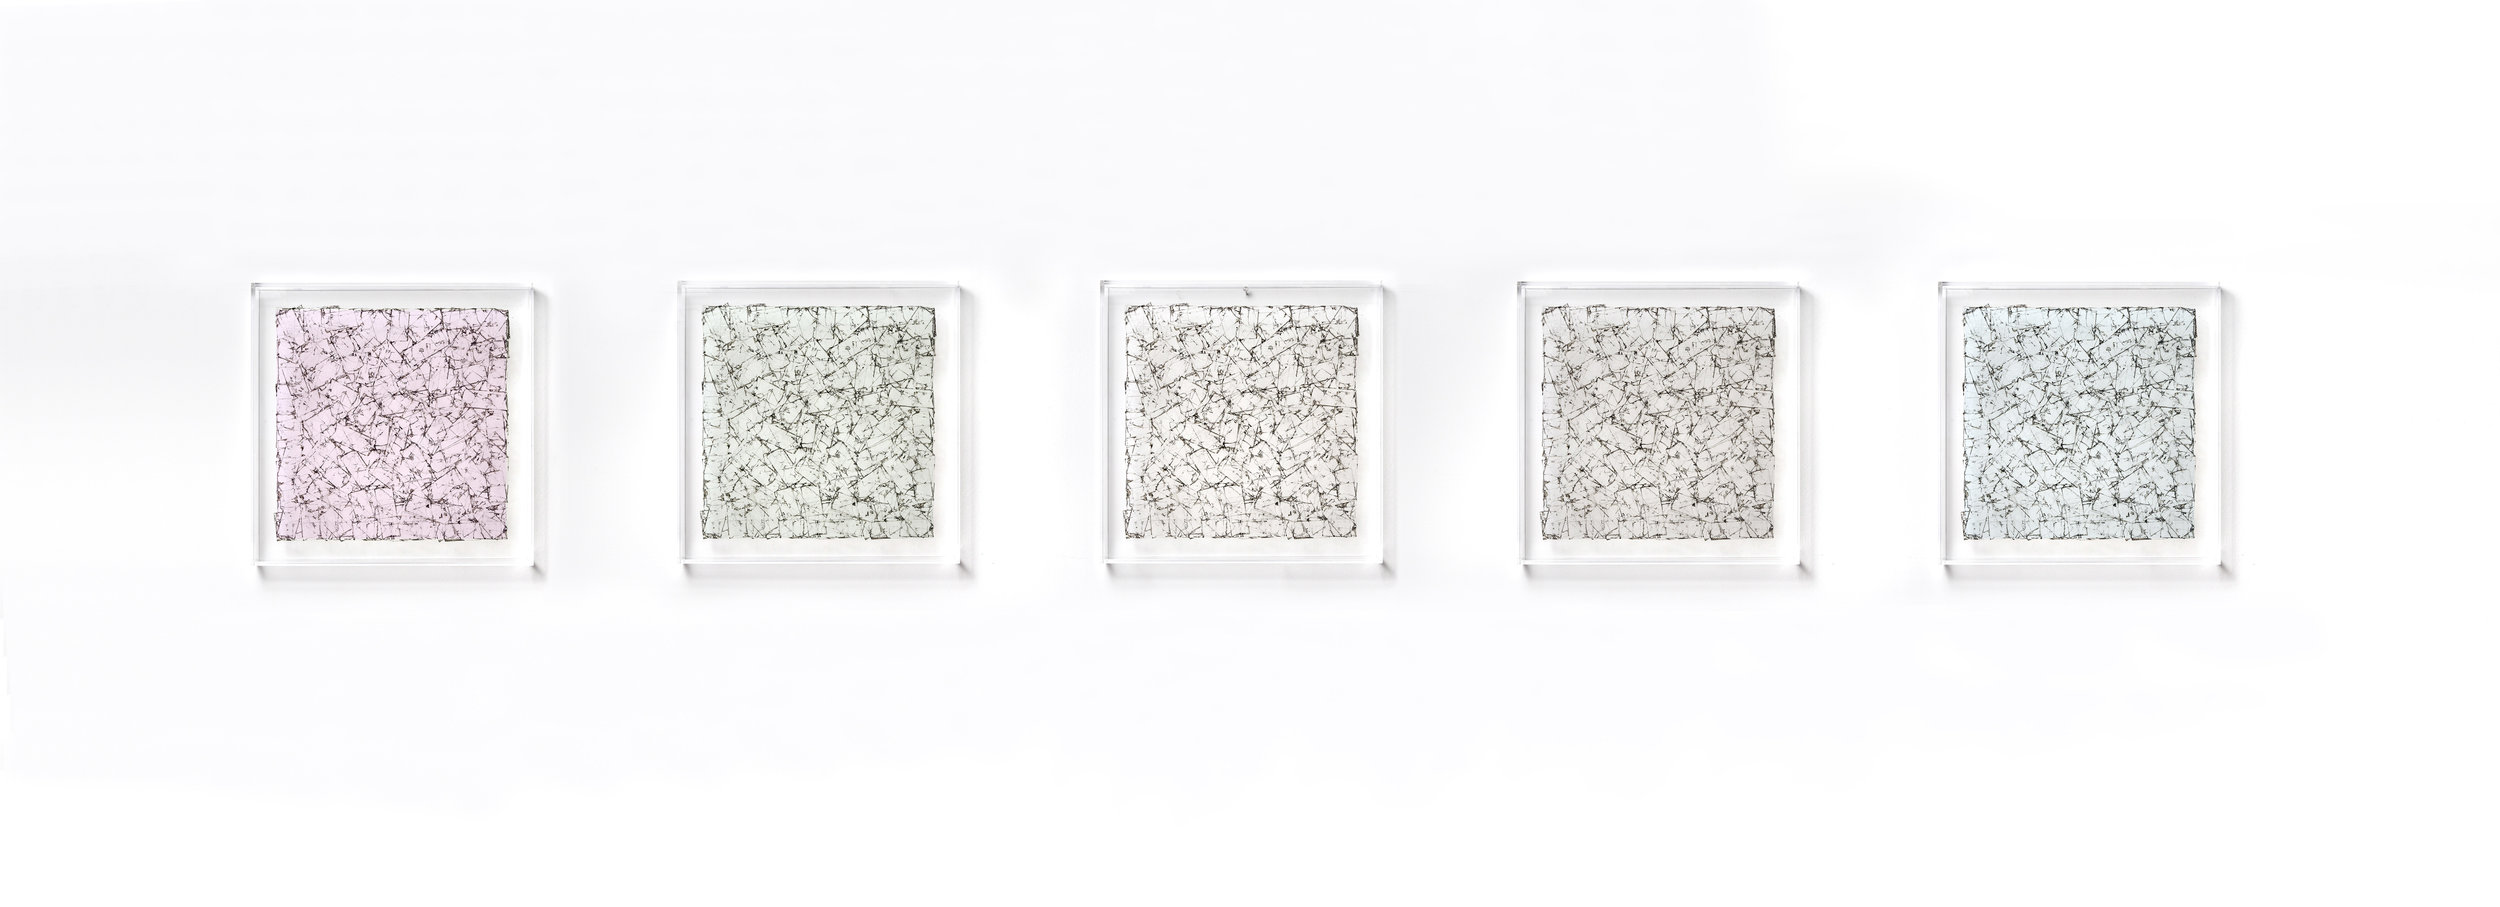 "Series of 5 12"" x 12"" plexi box tape pieces"